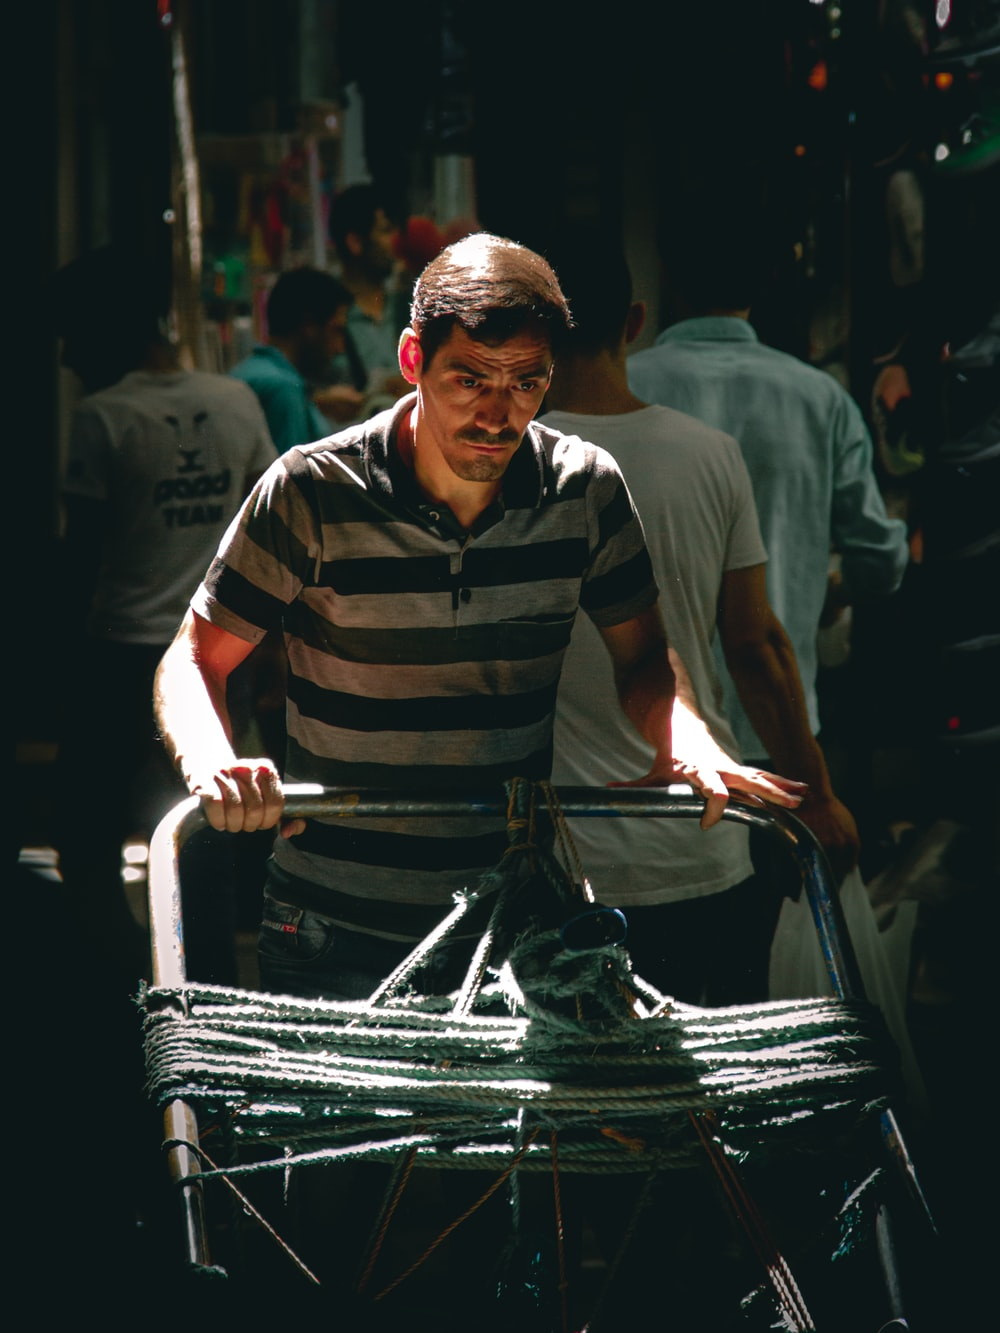 man in black and white stripe polo shirt holding black plastic bag